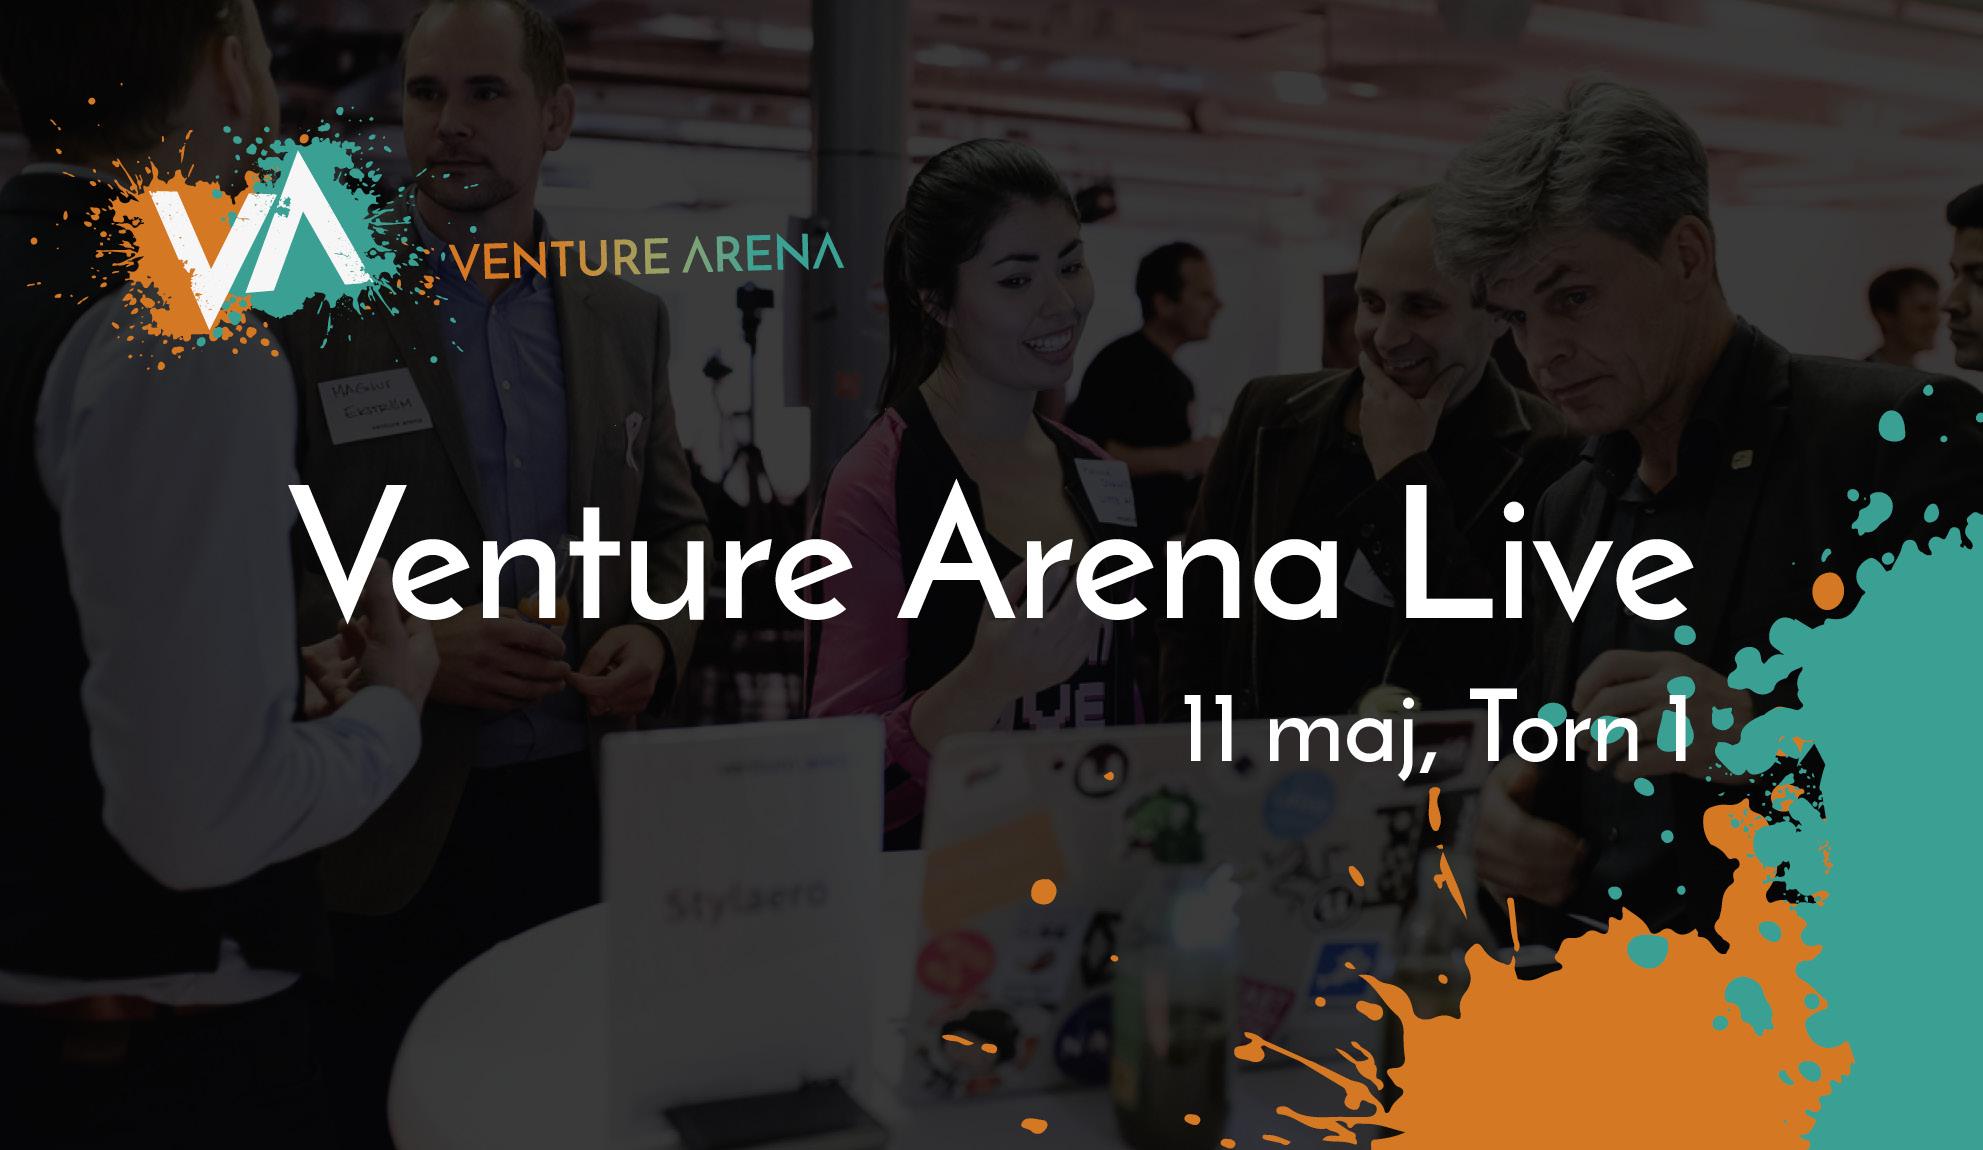 Venture Arena Live